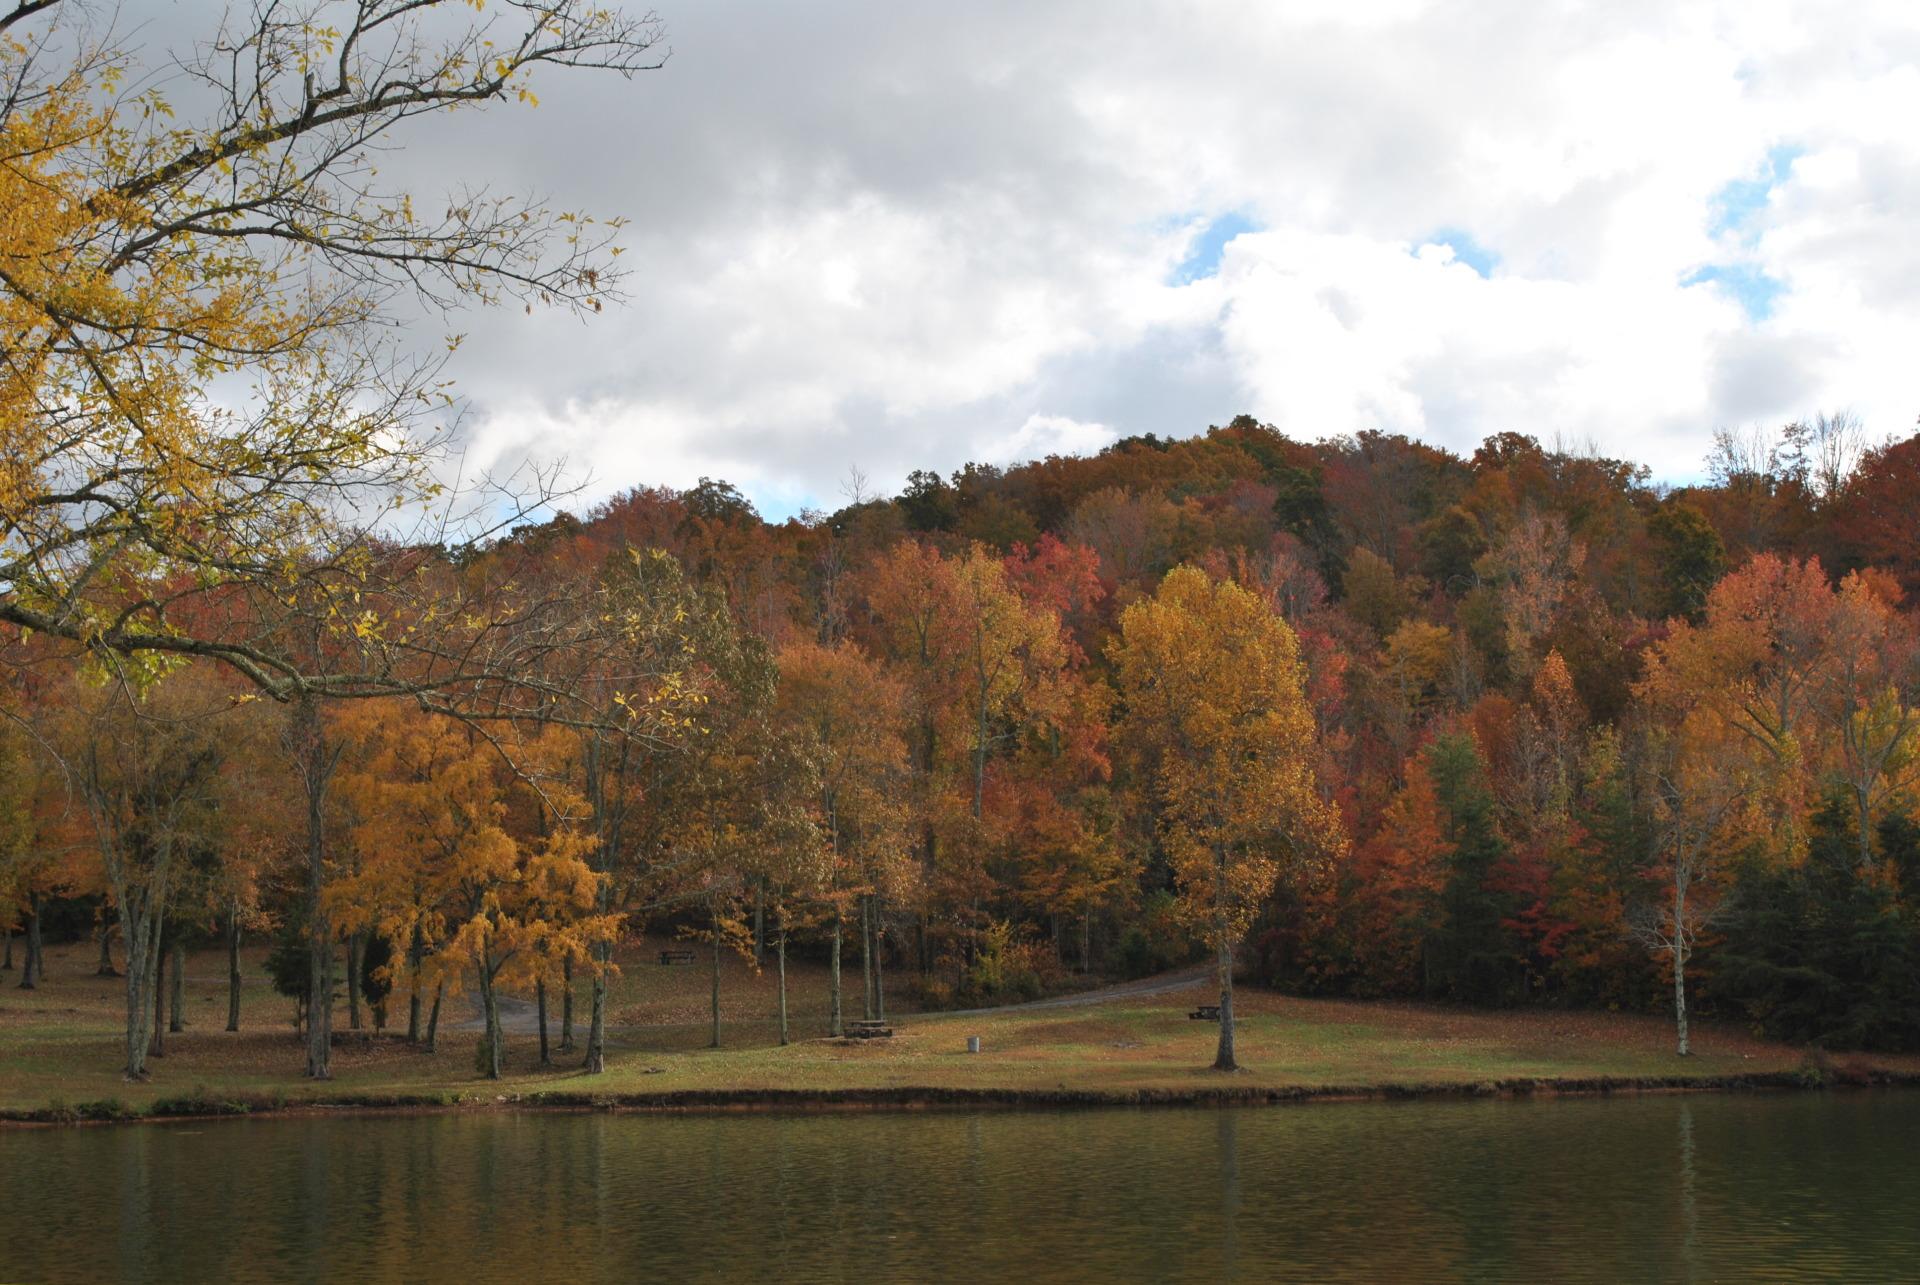 Rhea Springs Park